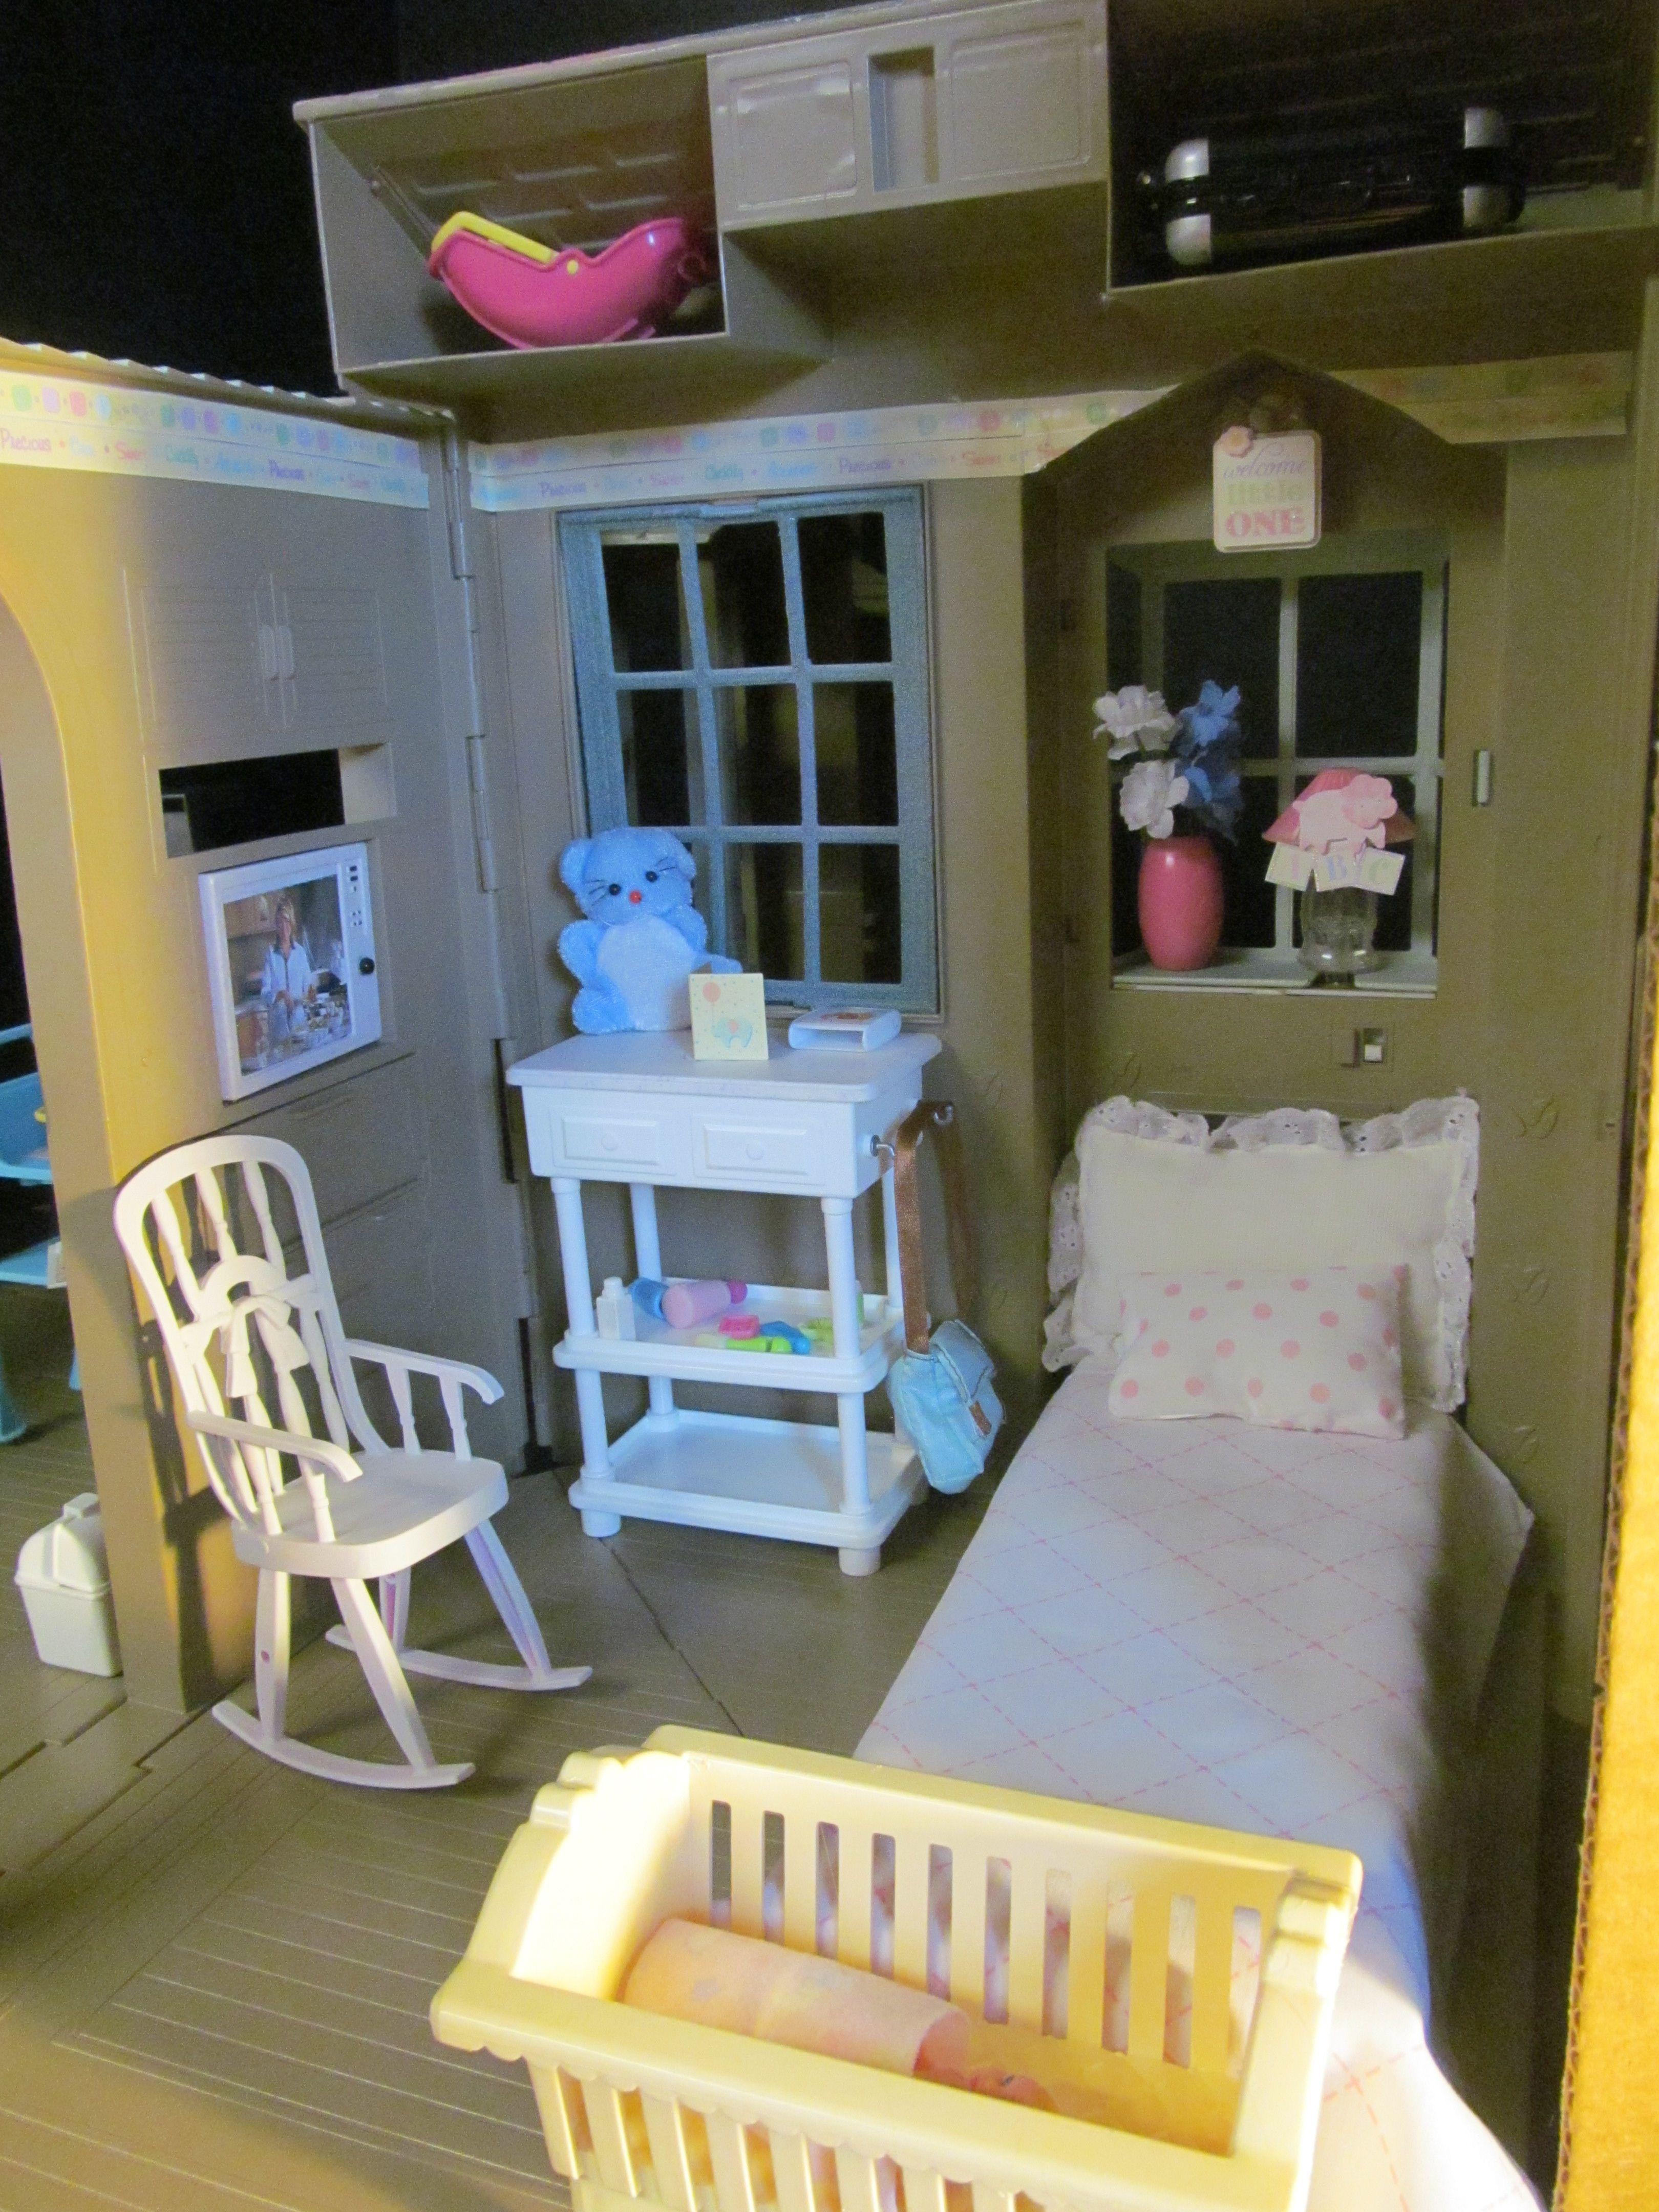 the wooden cottage cottages custom dresser penny mirror bedroom muskoka suite s furniture product